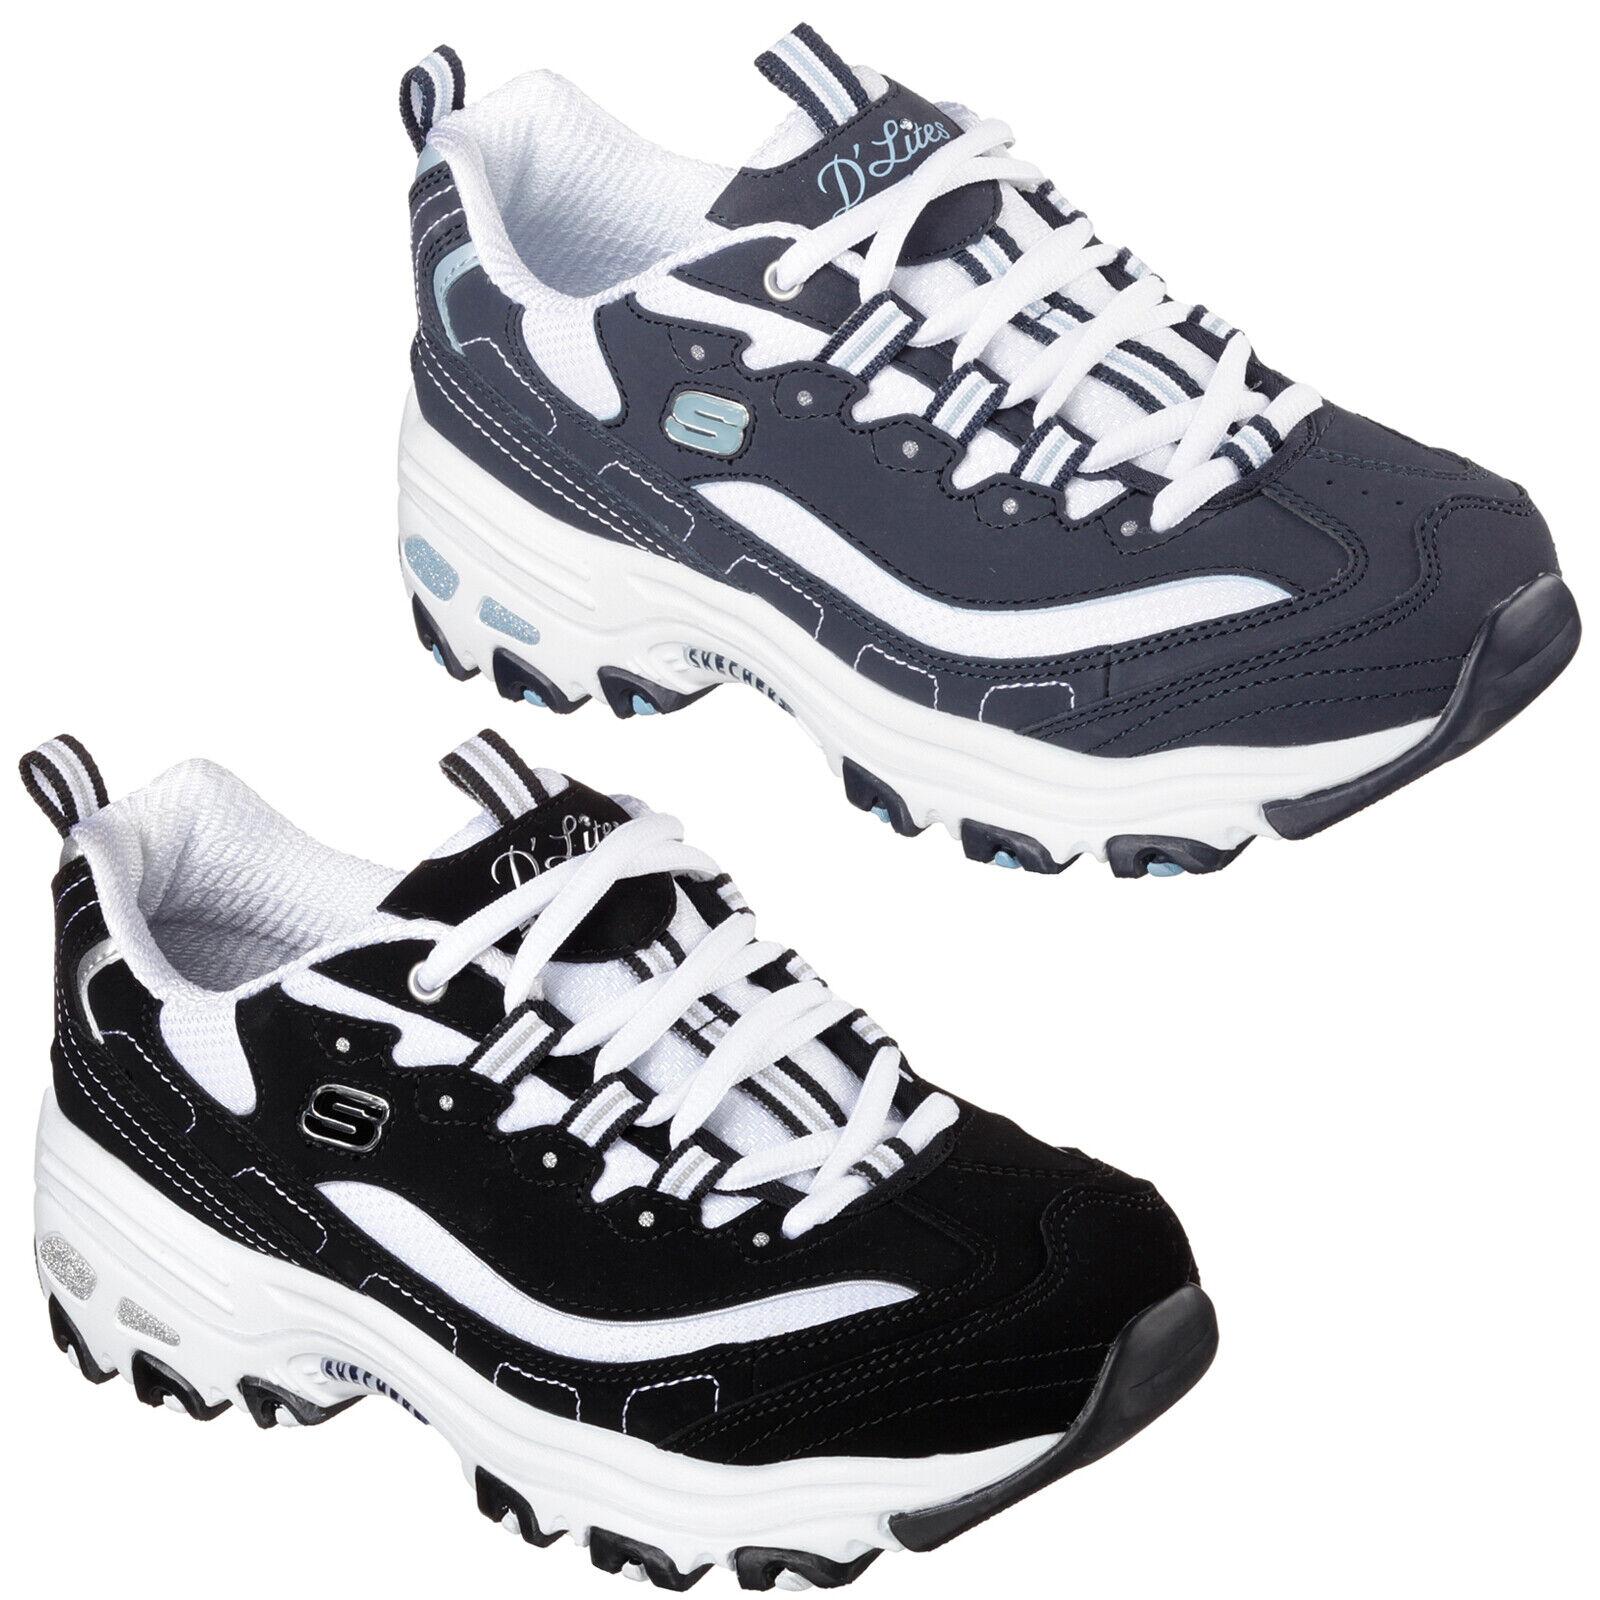 Skechers D'Lites - Biggest Fan Trainers Retro Chunky Fashion shoes Womens 11930